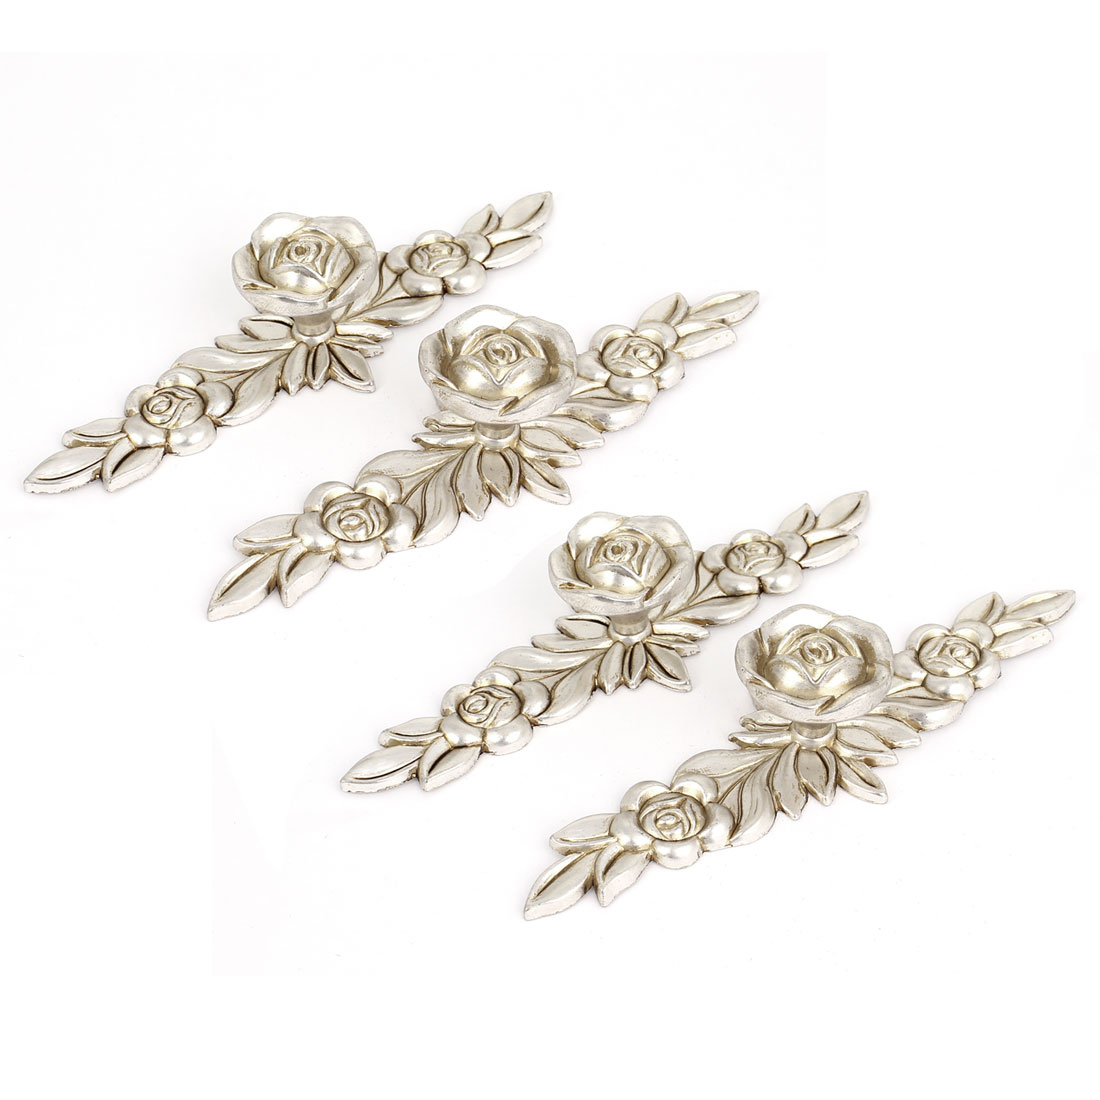 Antique Silver Rose Flower Door Knobs Dresser Cabinet Pull Handles 145mm 4pcs